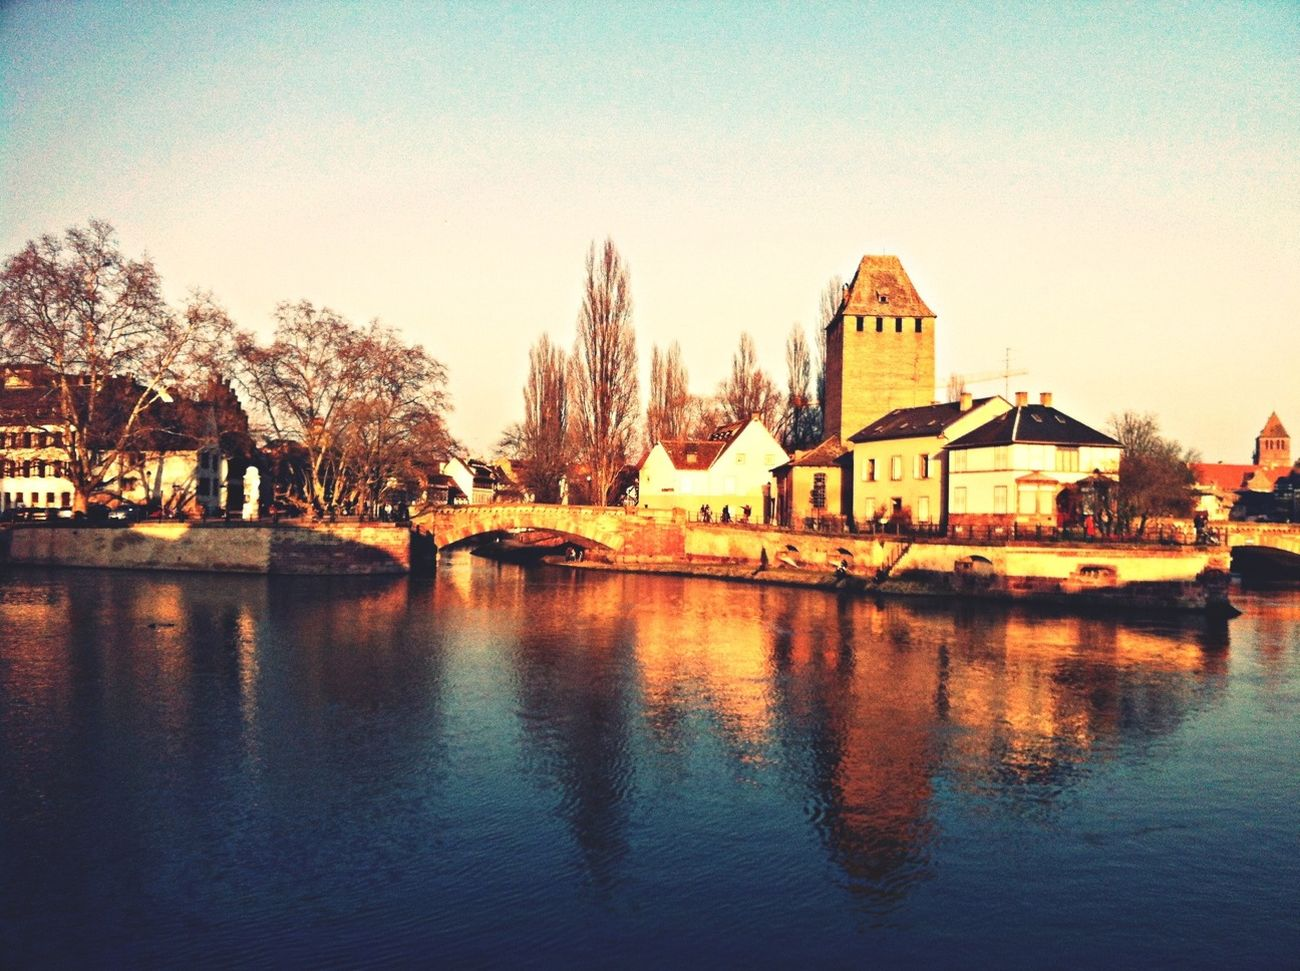 Architecture River Landscape History